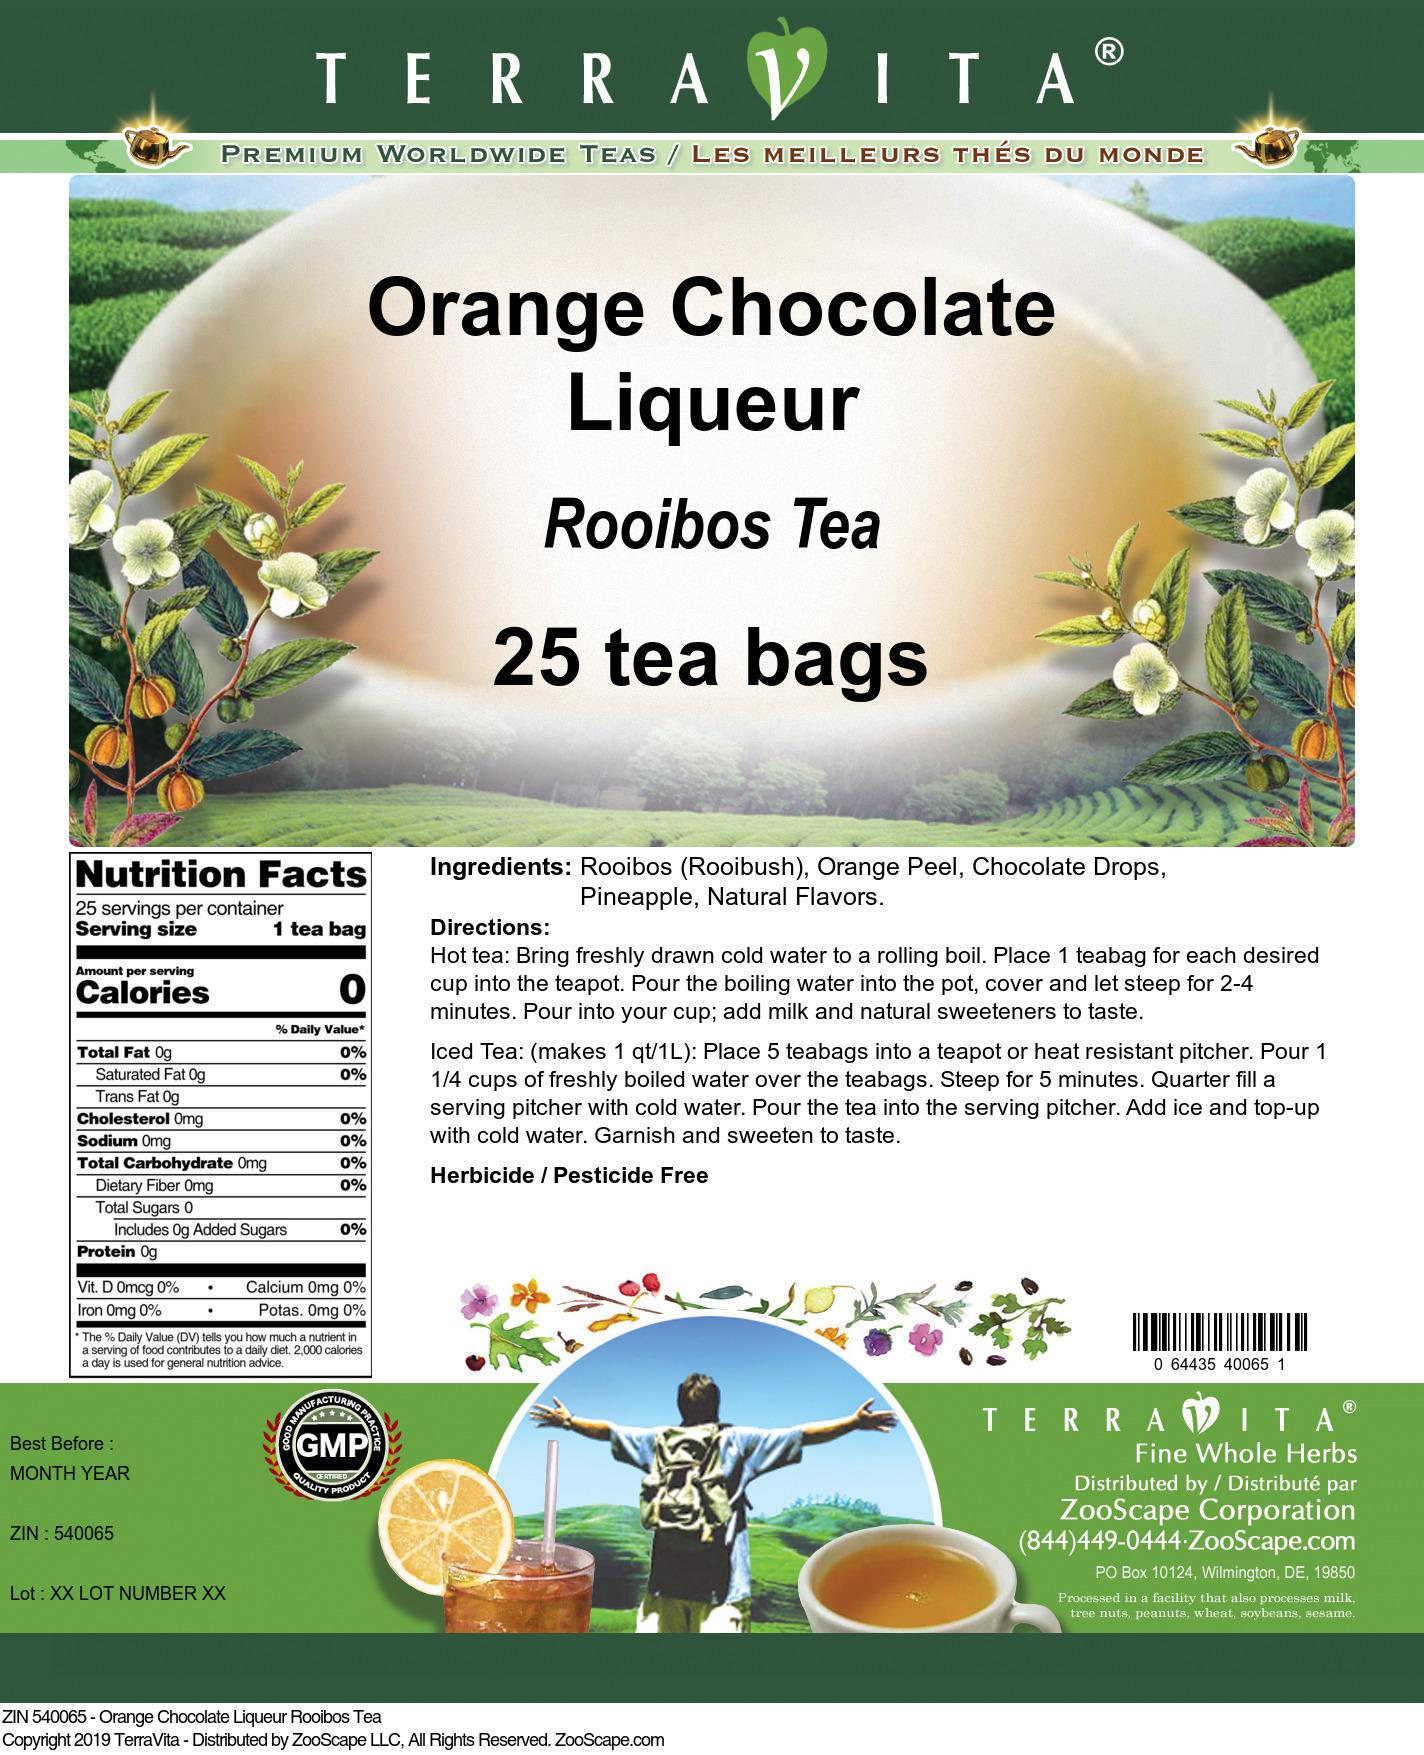 Orange Chocolate Liqueur Rooibos Tea